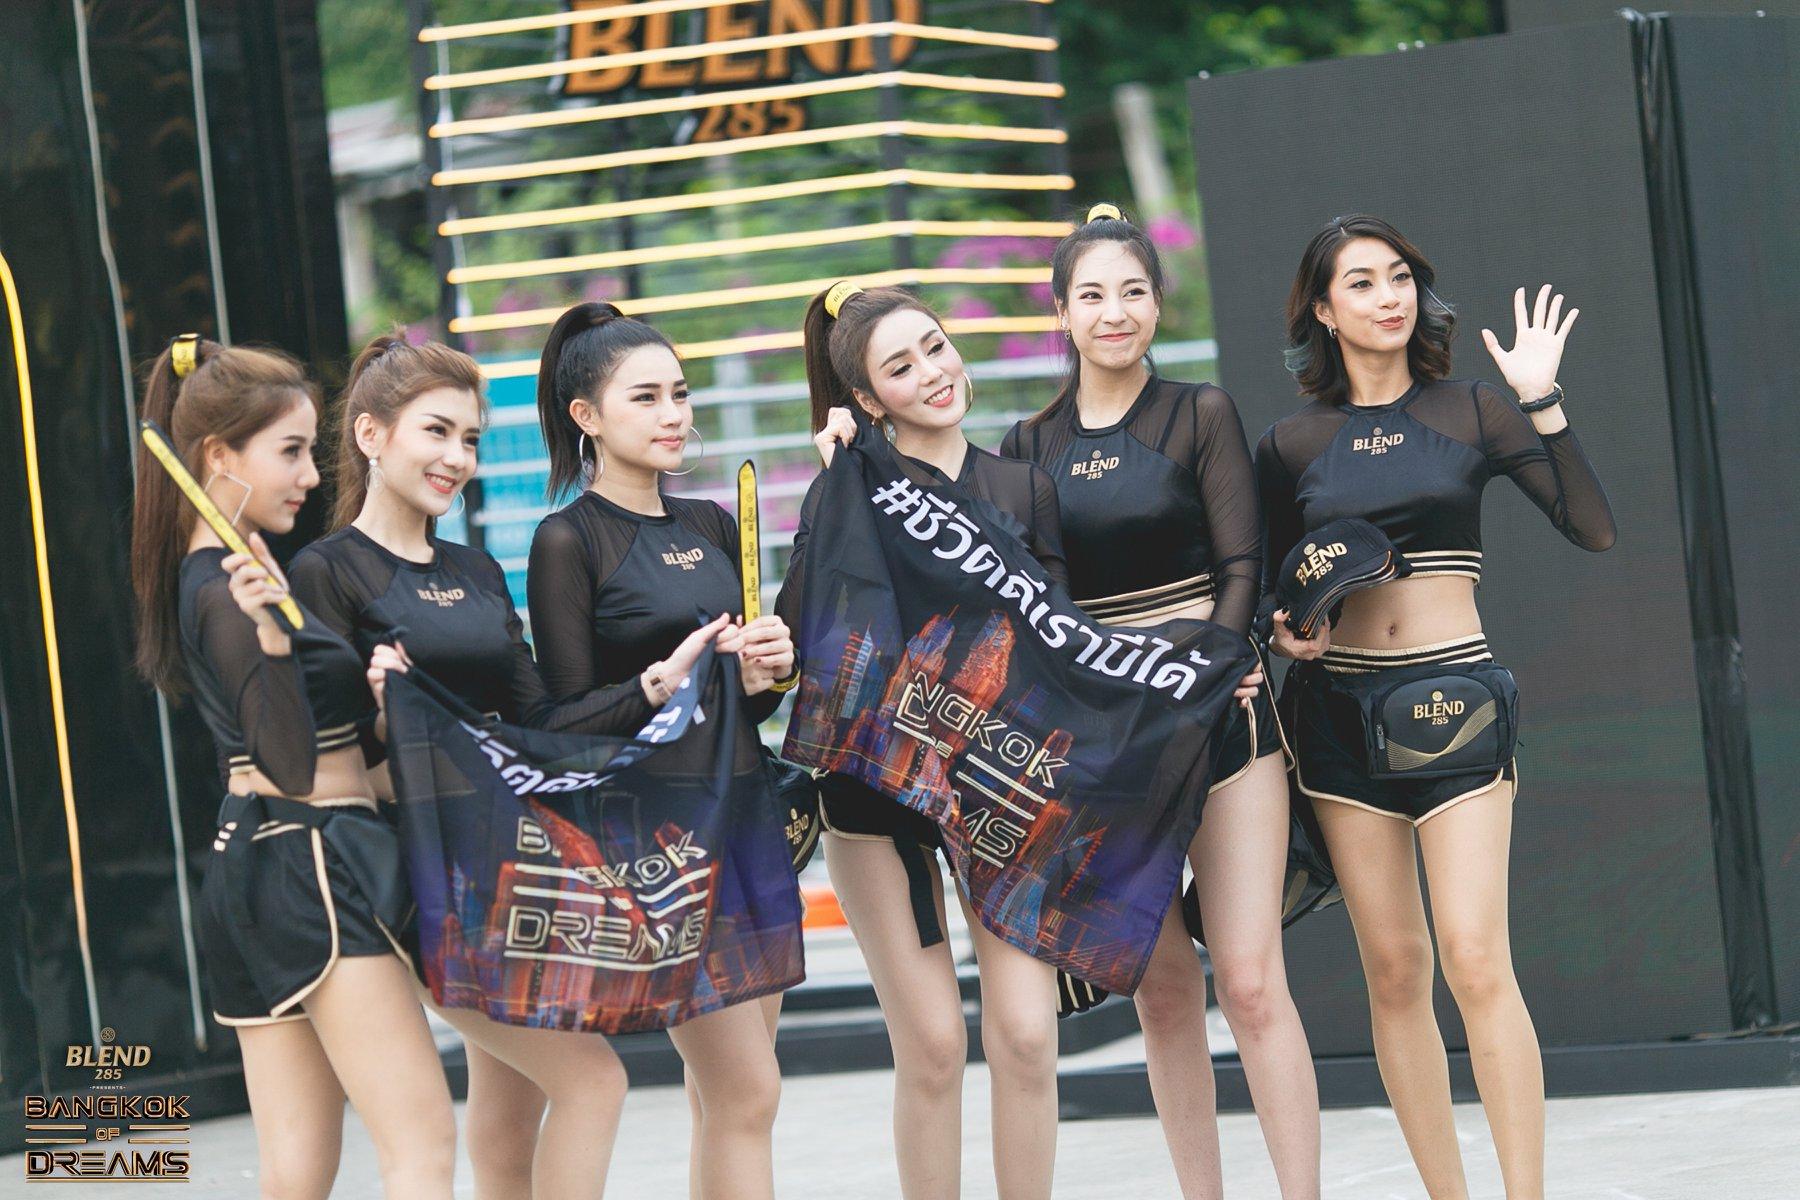 Bangkok Of Dreams